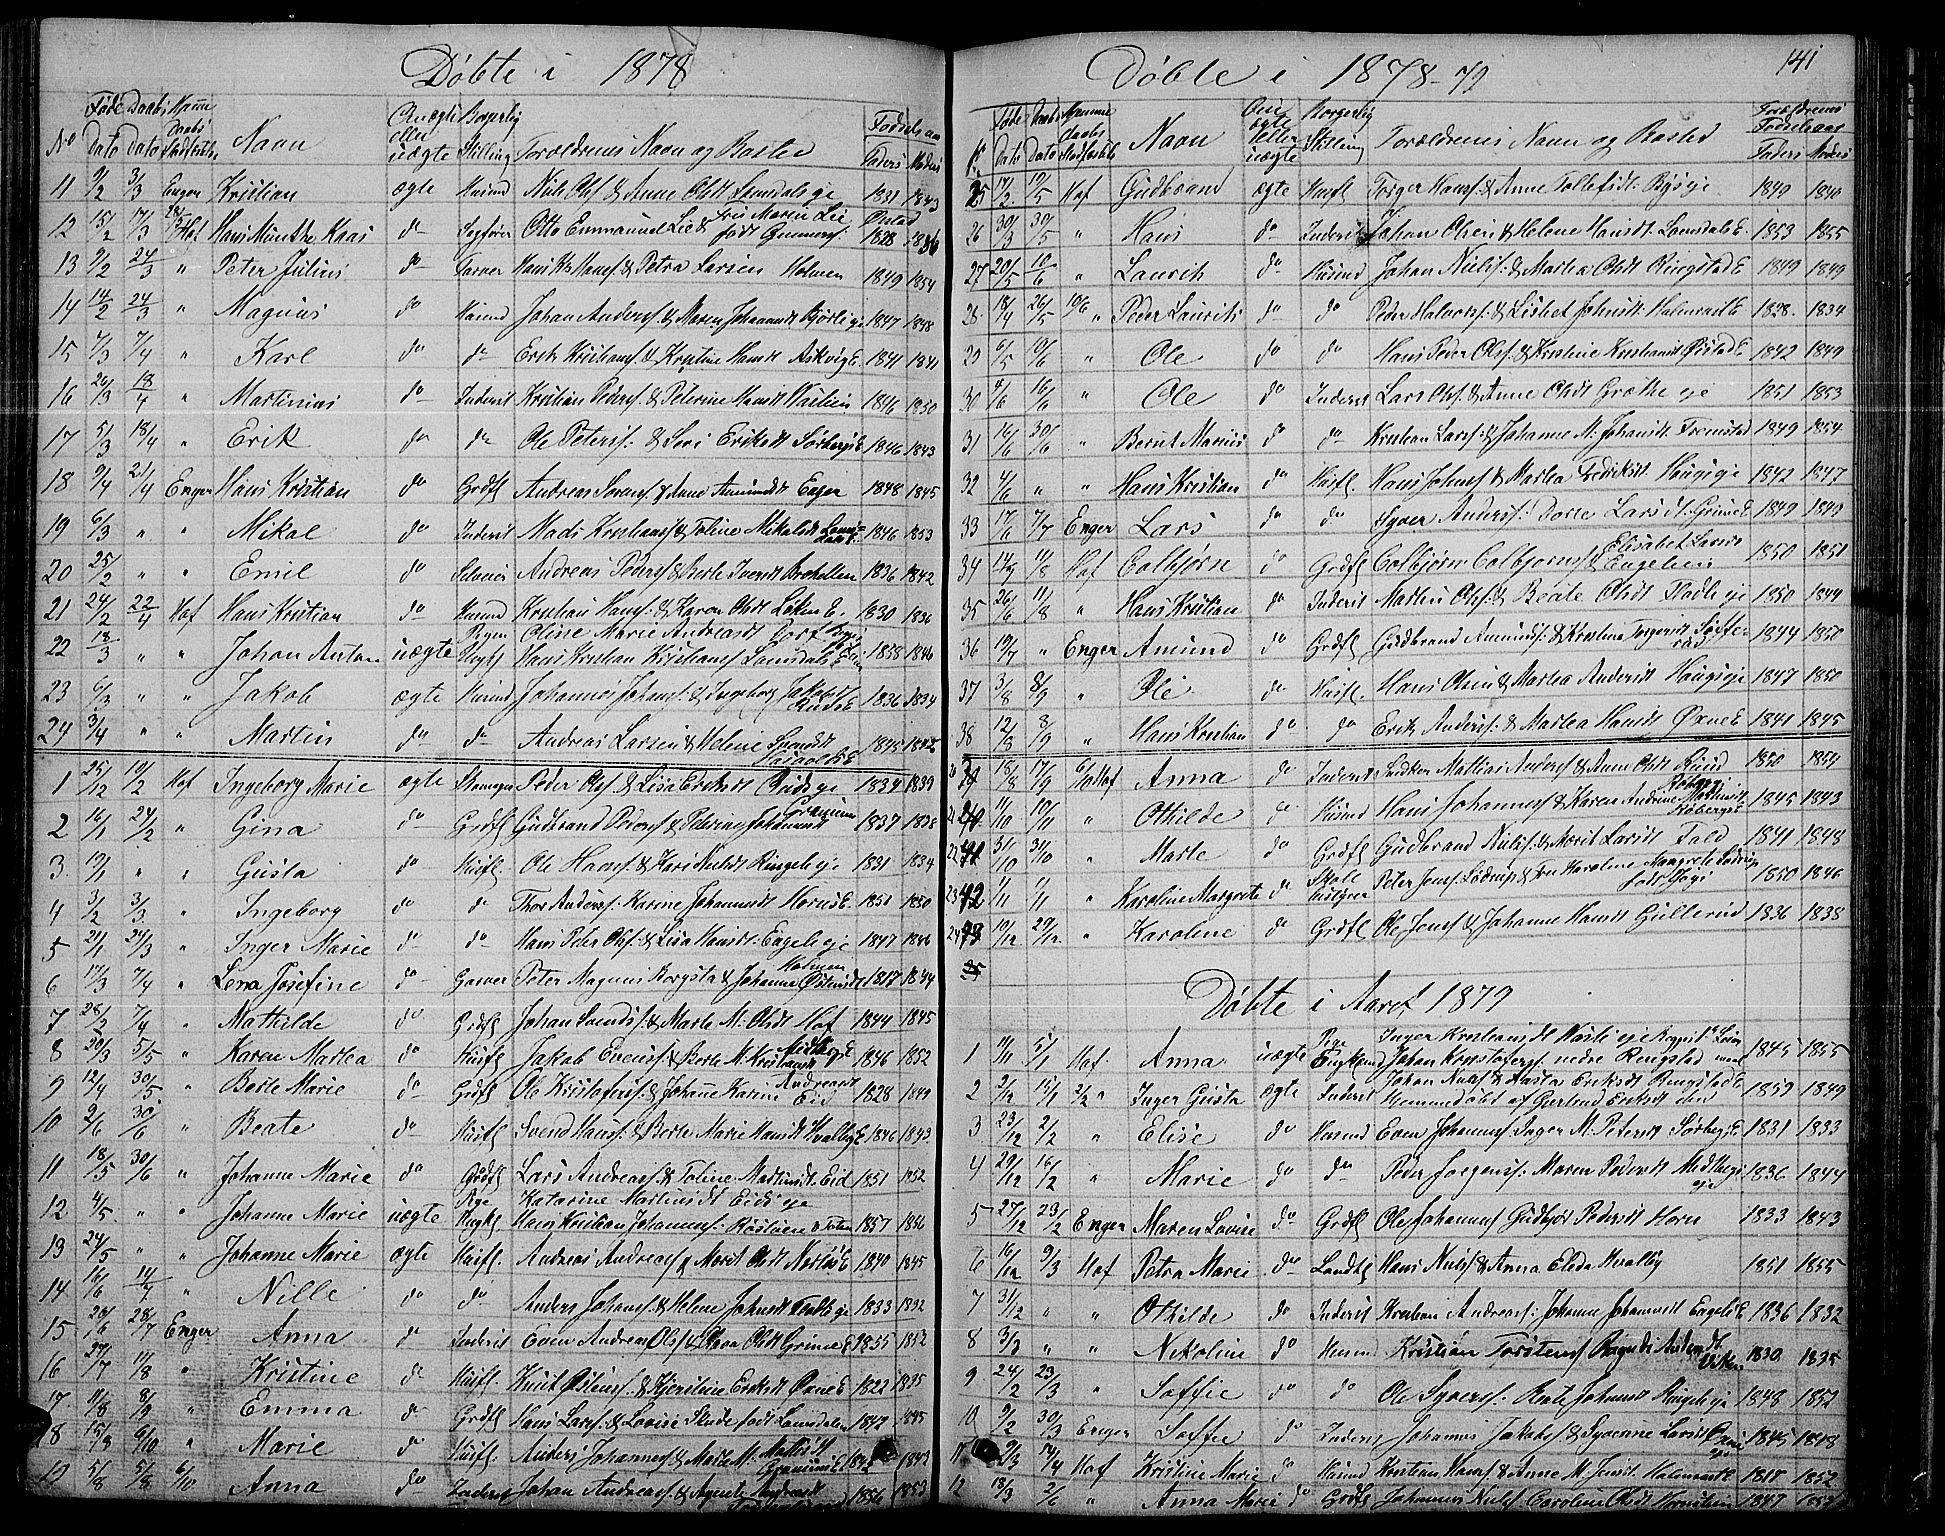 SAH, Søndre Land prestekontor, L/L0001: Klokkerbok nr. 1, 1849-1883, s. 141